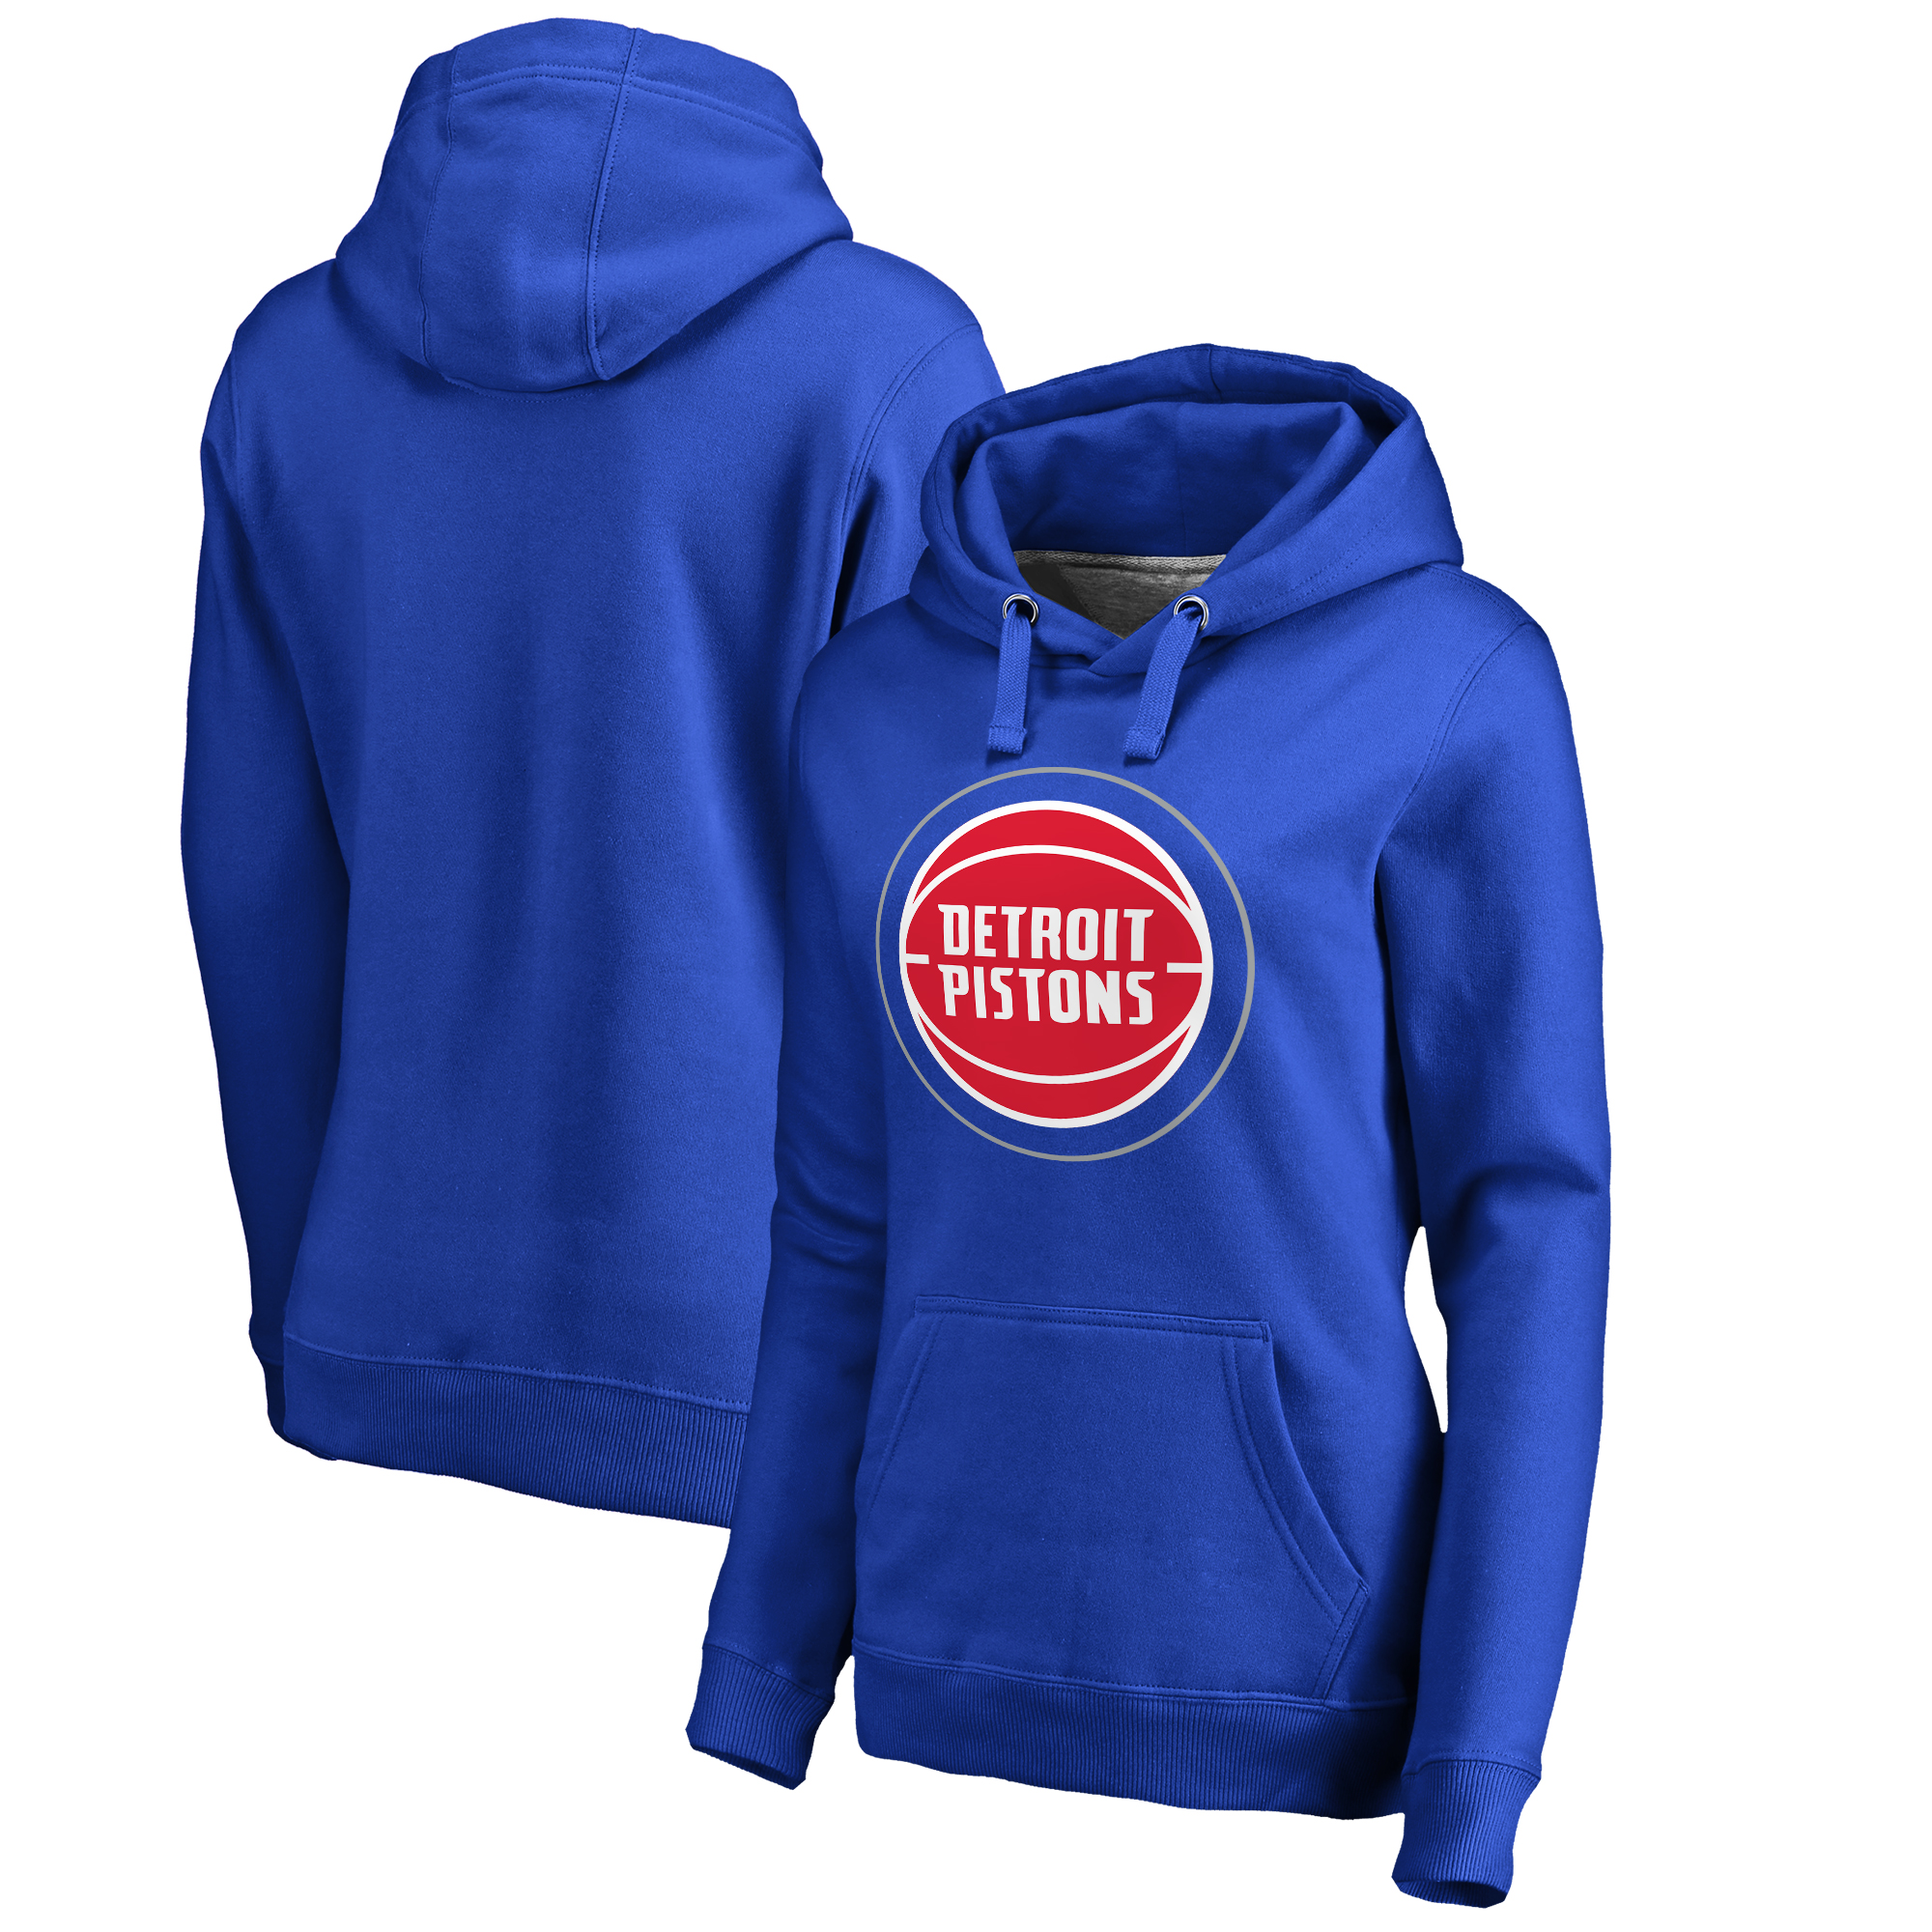 Detroit Pistons Fanatics Branded Women's Plus Sizes Team Primary Logo Pullover Hoodie - Royal